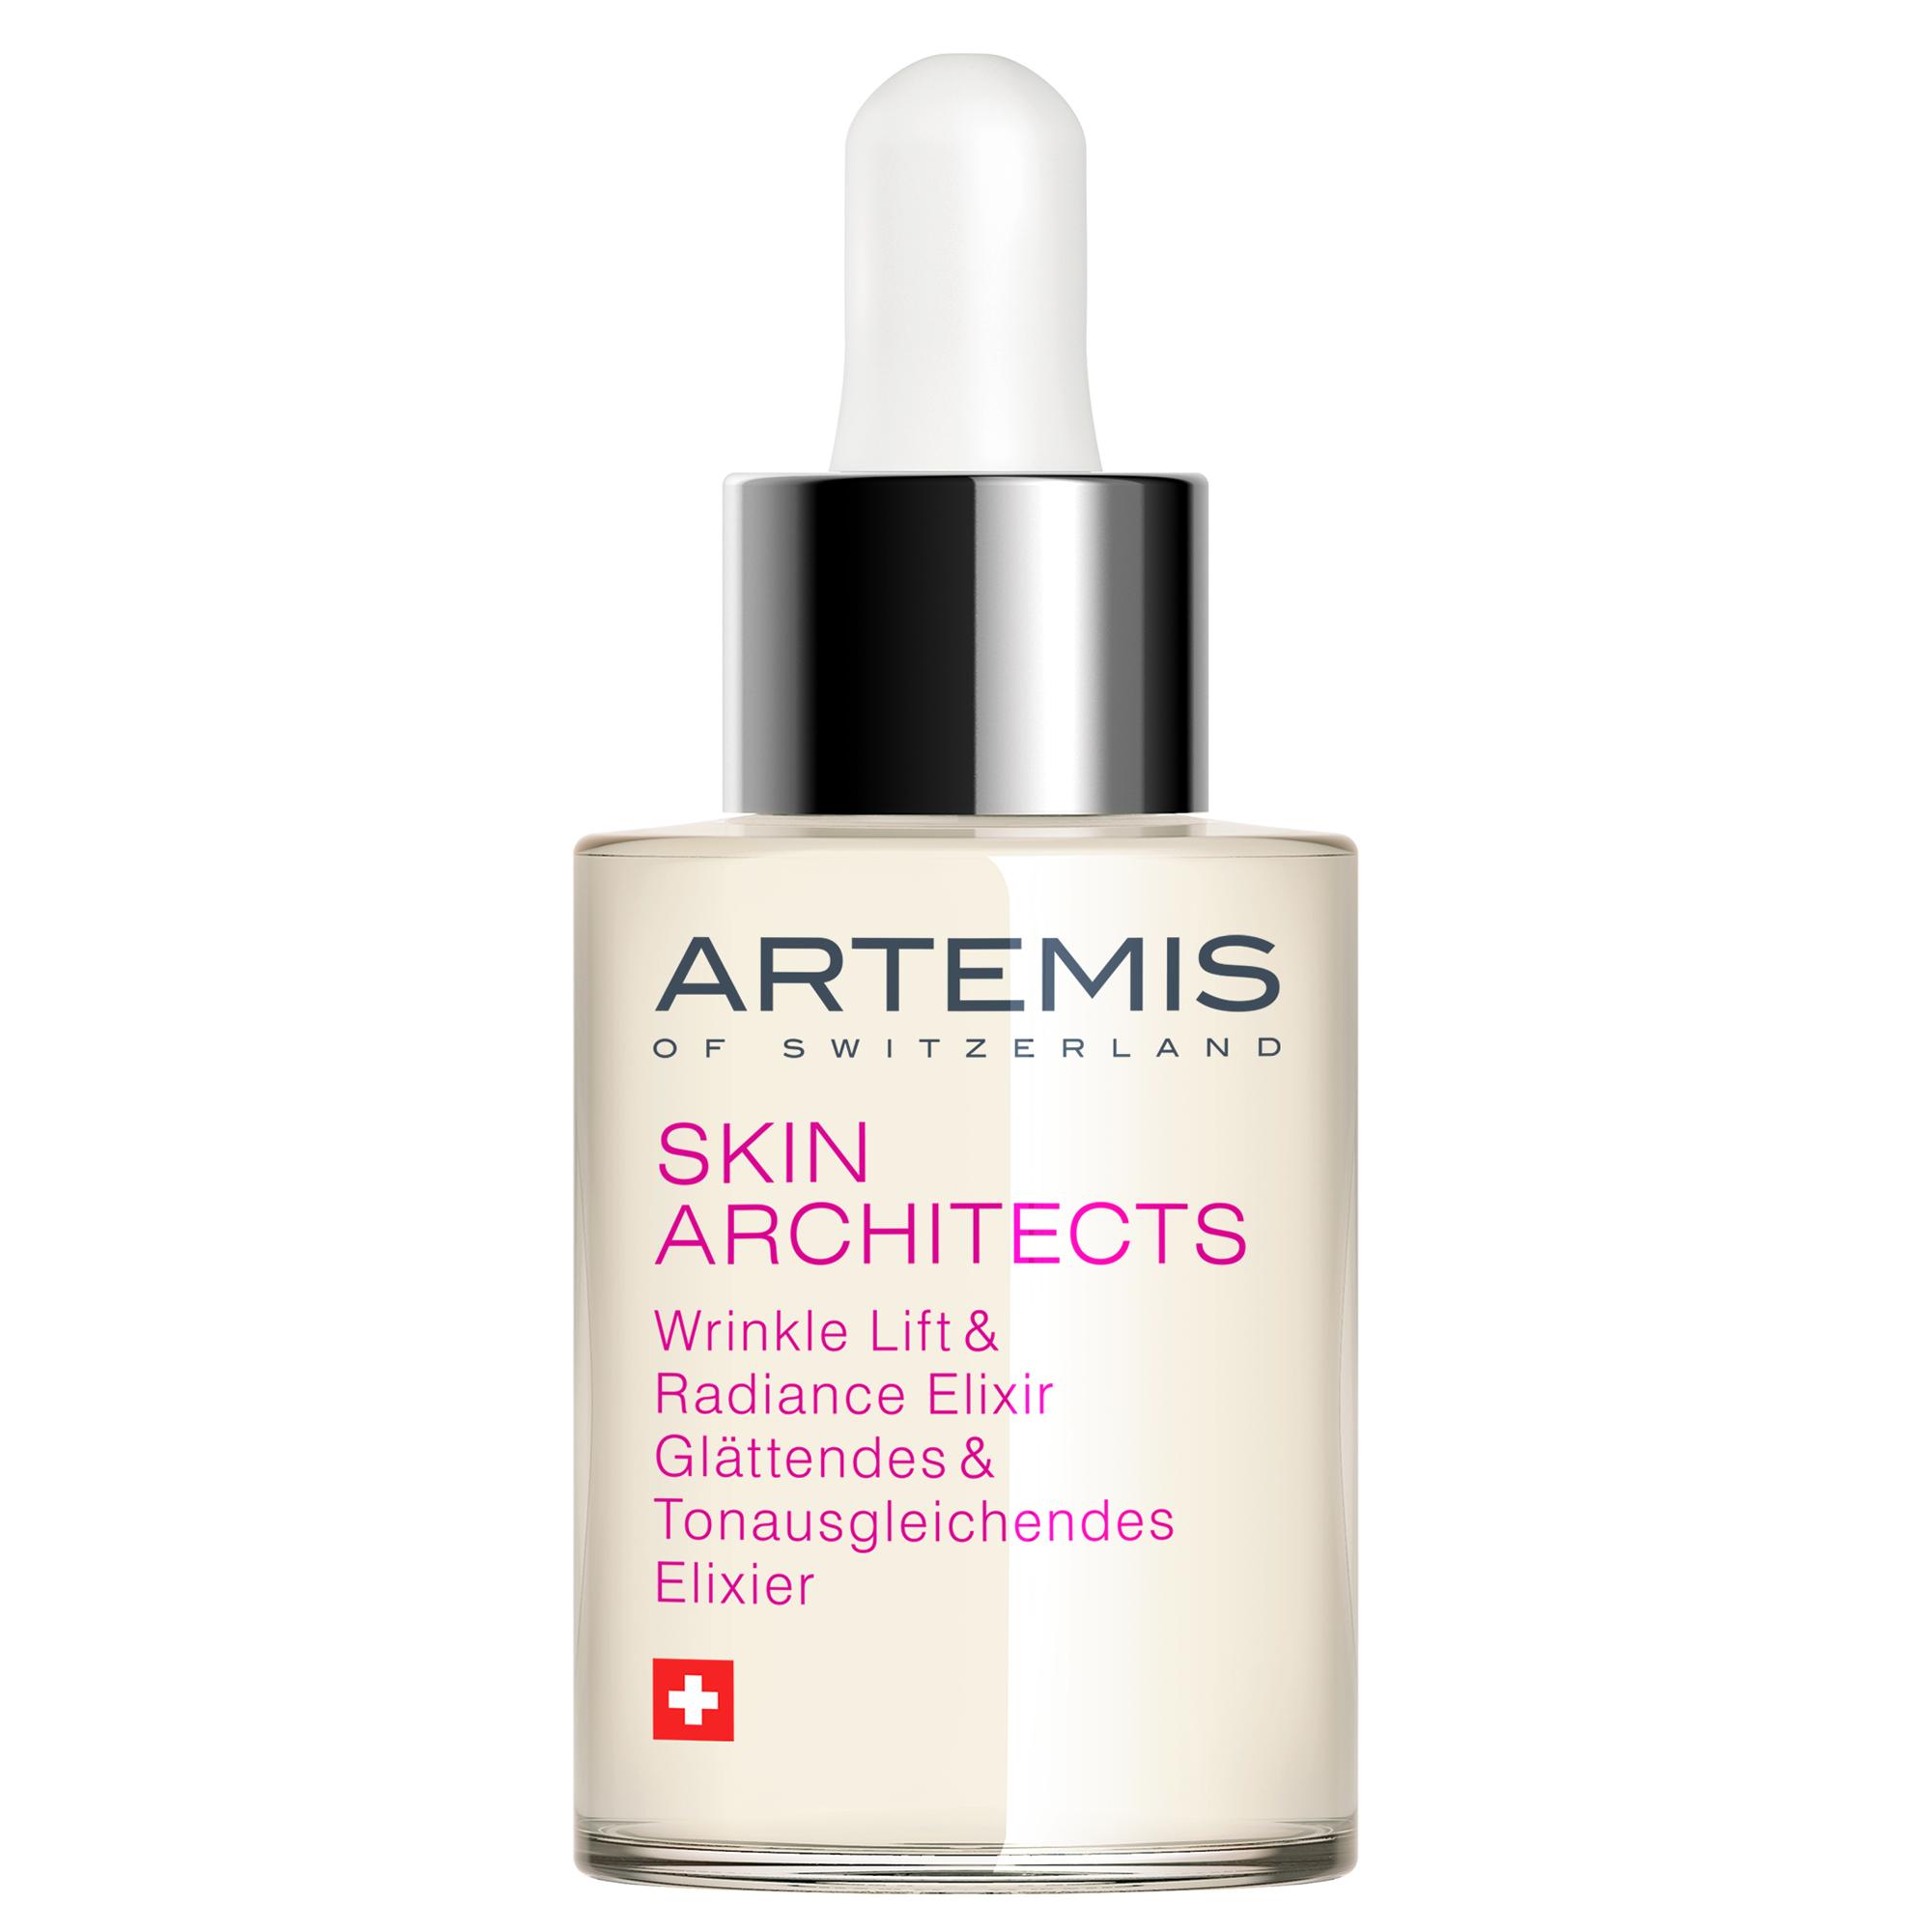 Artemis Skin Architects Wrinkle Lift & Radiance Elixir 30ml